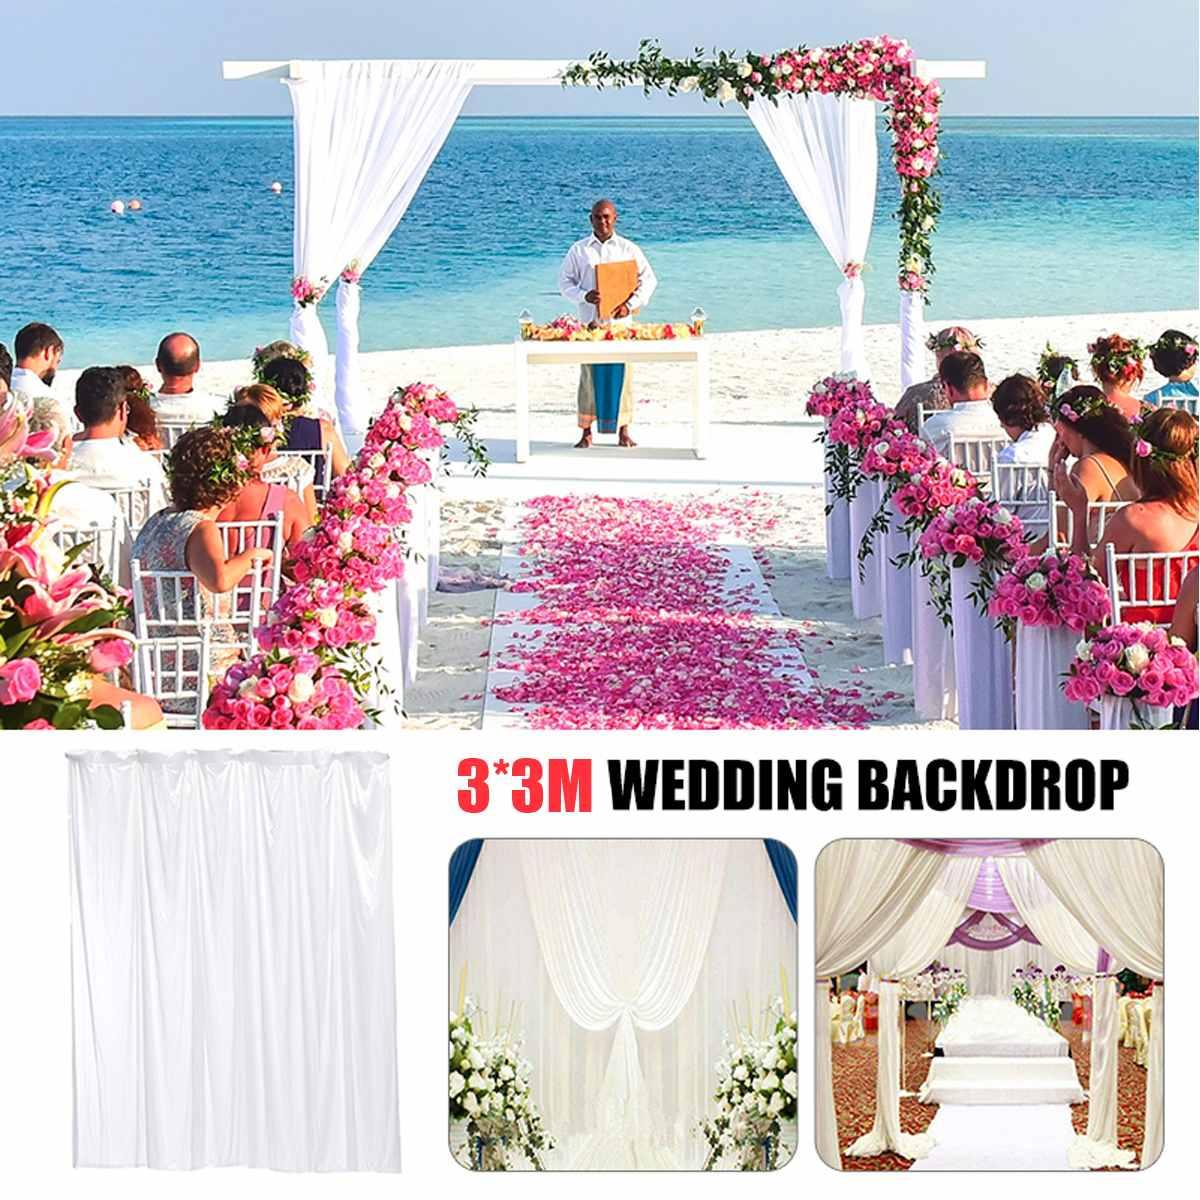 3x3m White Elegant Wedding Backdrop Curtain Drape Wedding Supplies Simple Curtain Drapes Background For Party Event3x3m White Elegant Wedding Backdrop Curtain Drape Wedding Supplies Simple Curtain Drapes Background For Party Event